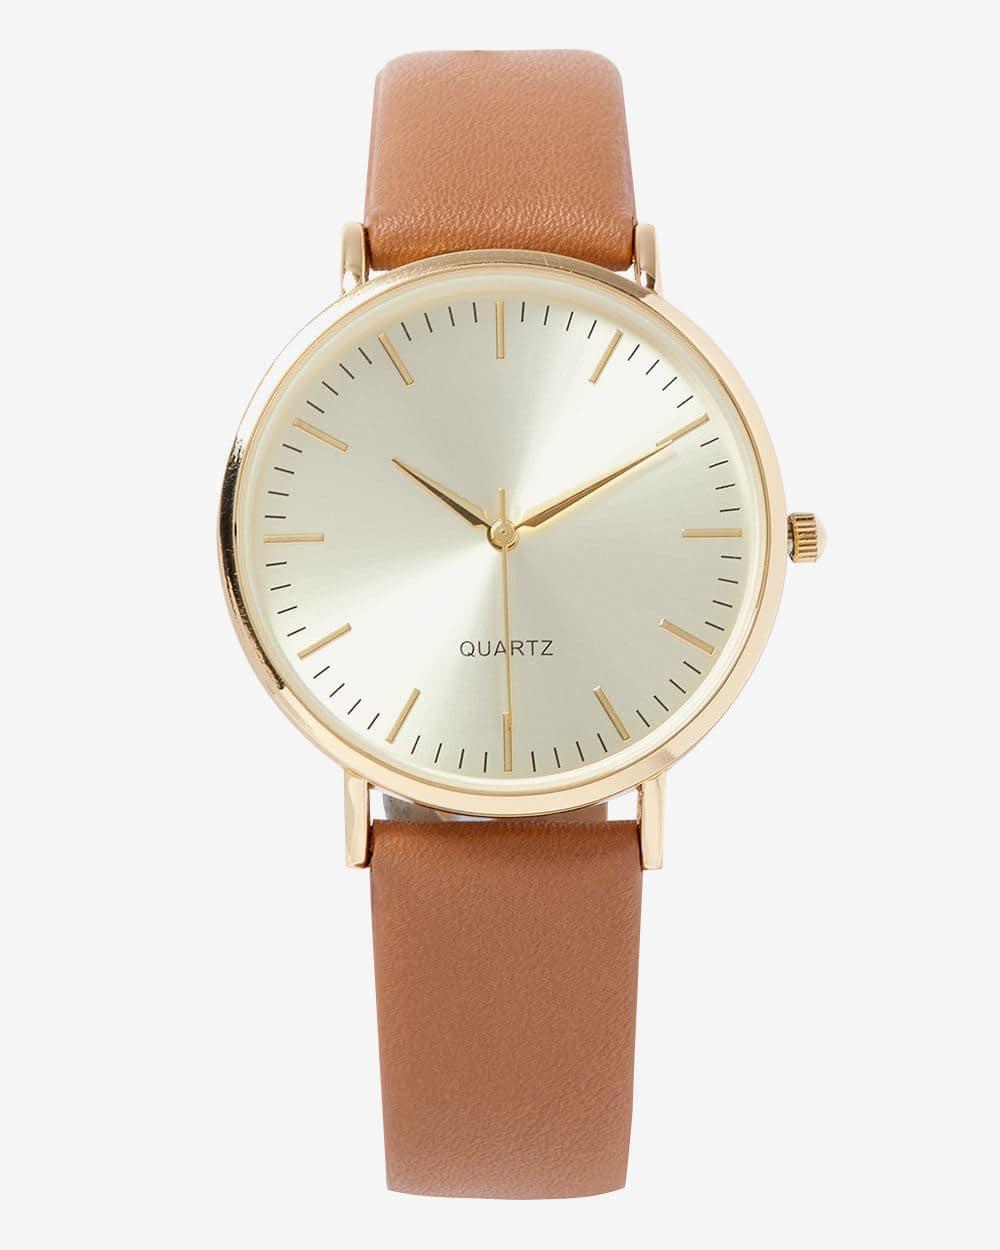 Montre-bracelet or et beige